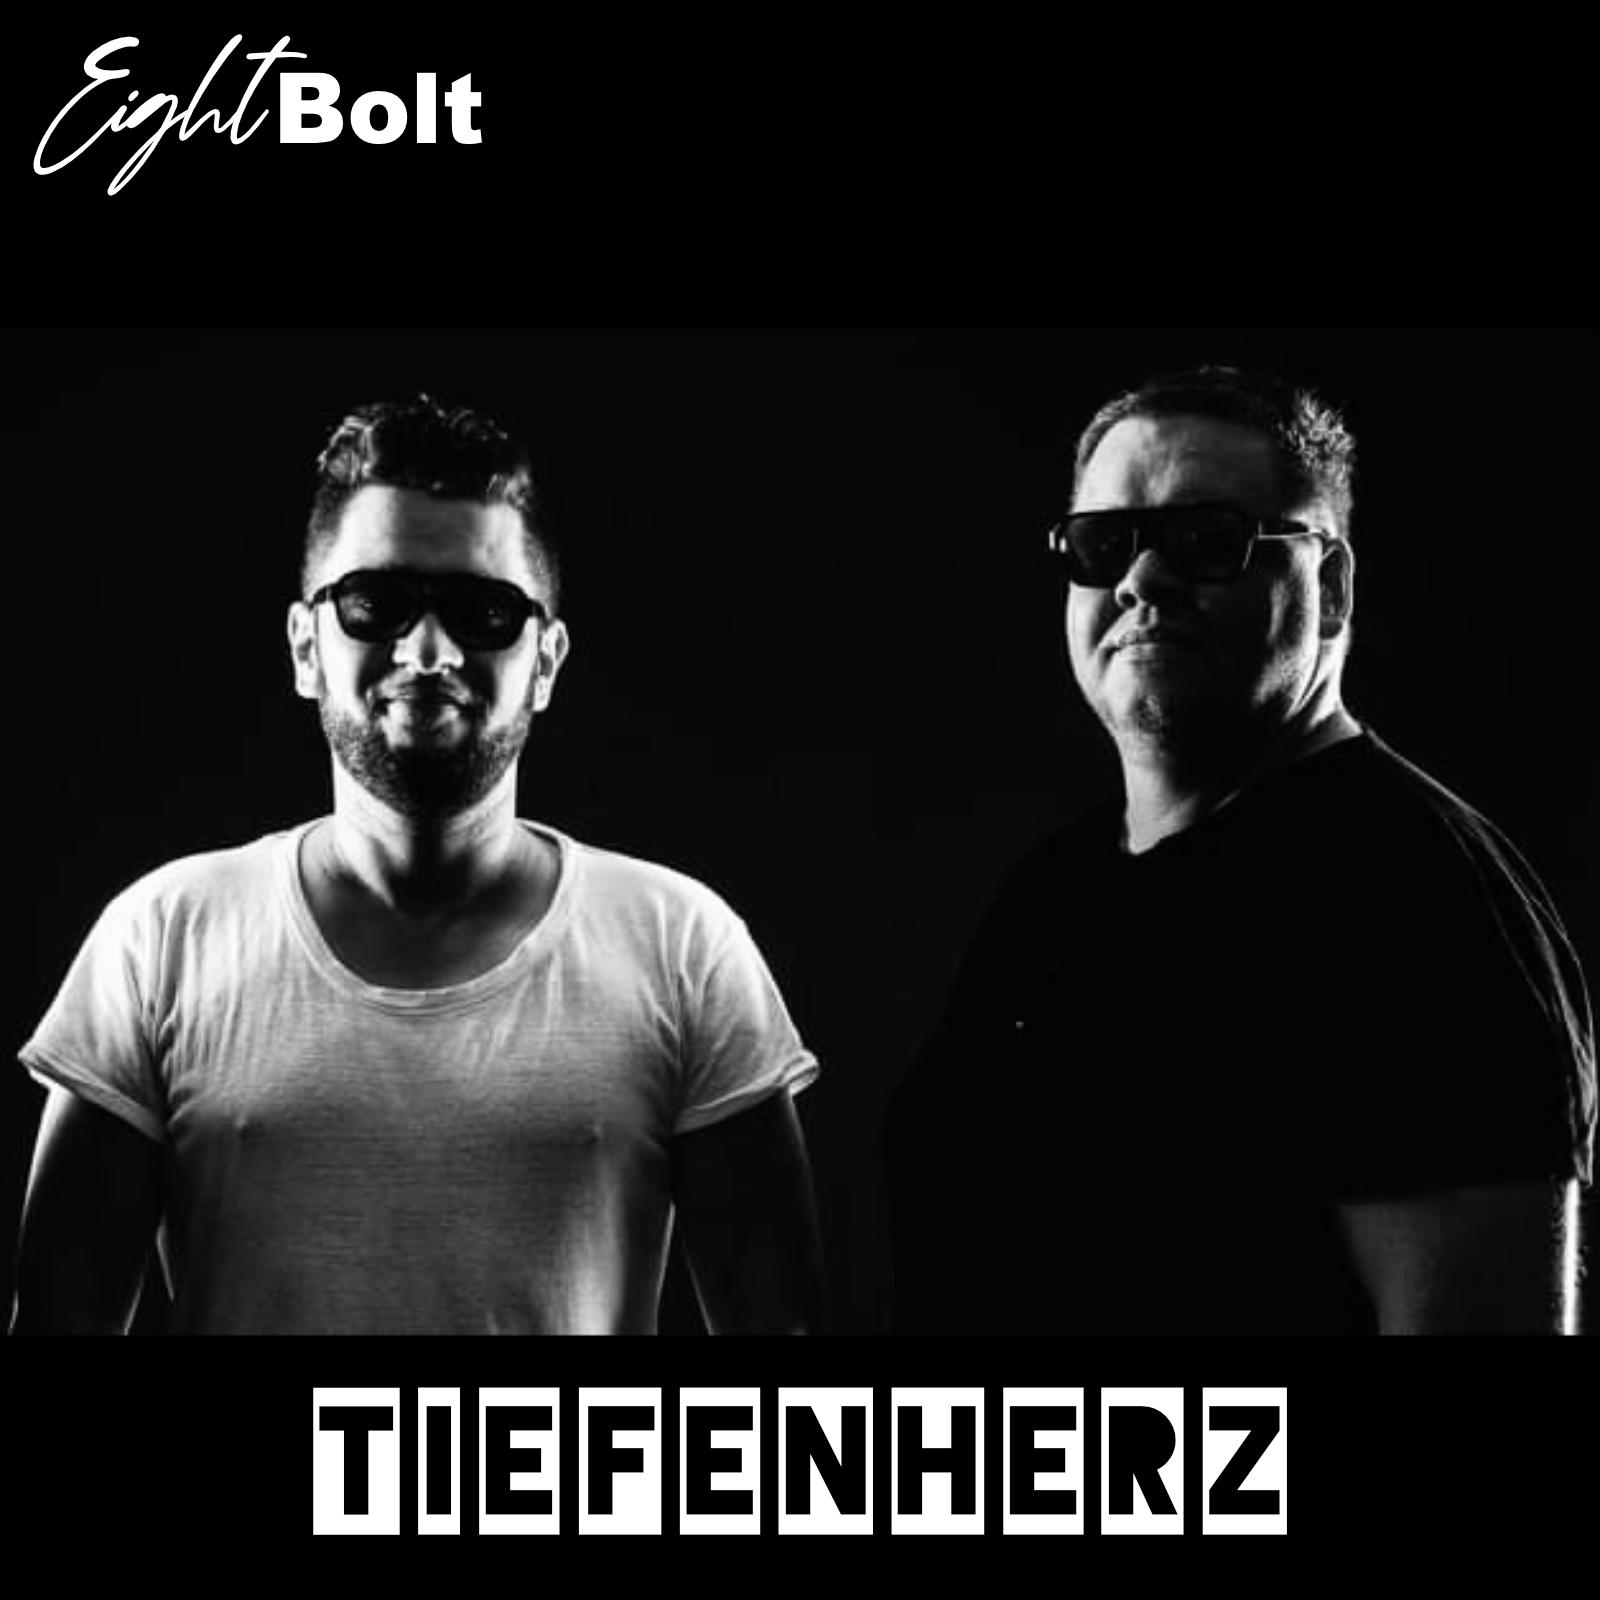 EightBolt Guest Podcast Part 20 with – Tiefenherz (Wuttig&Reuter)